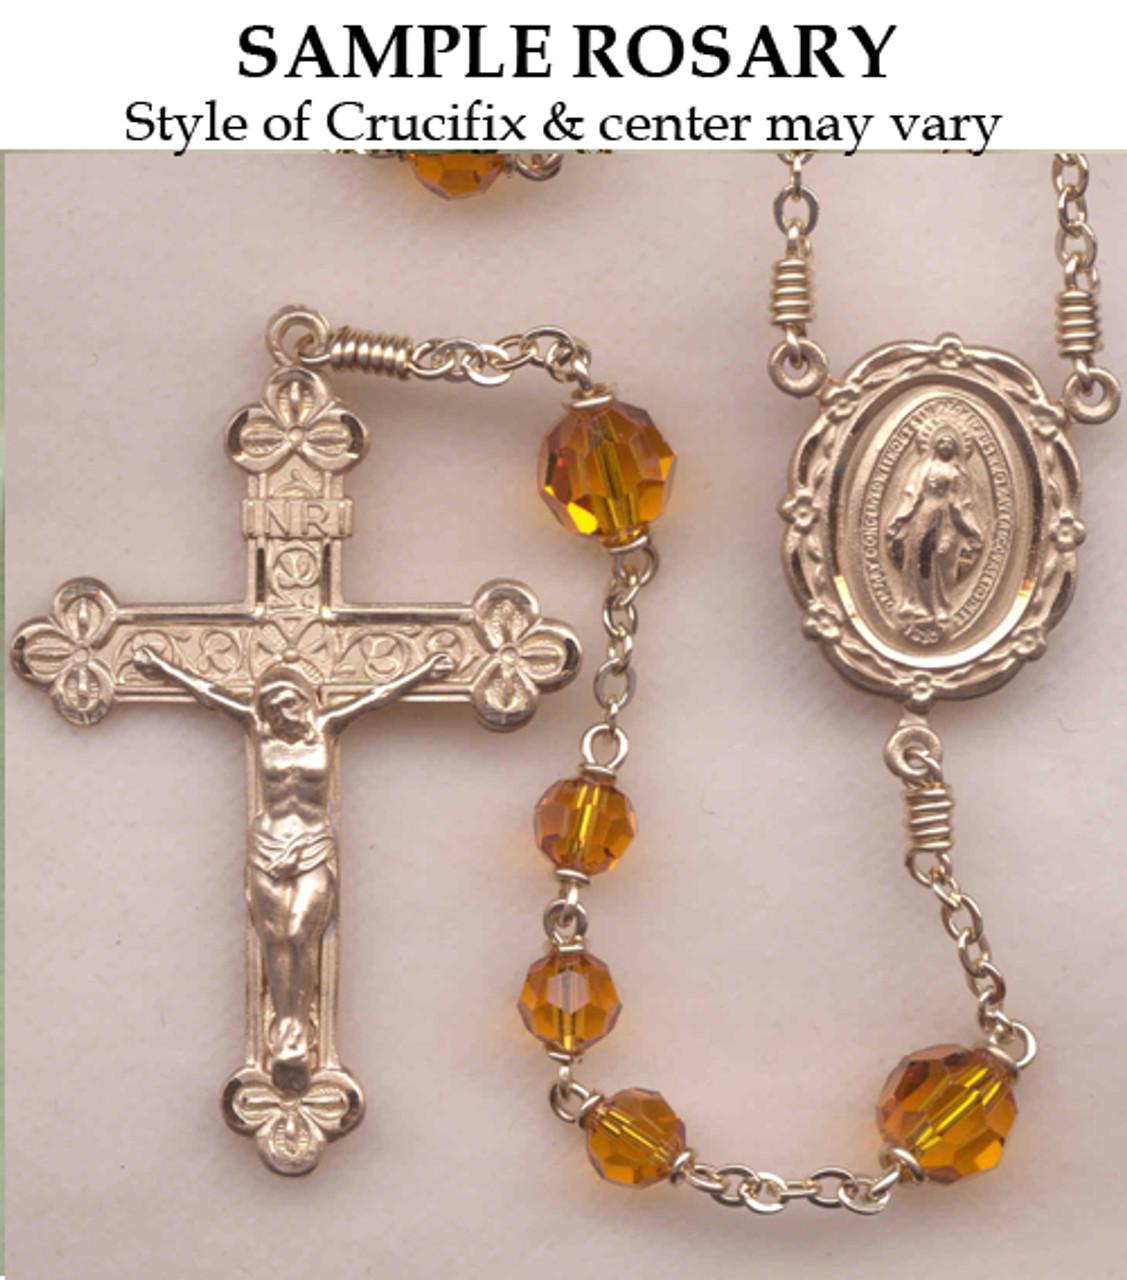 Rosary Restoration Rosary Parts Glass Rosary Beads Catholic Crafting